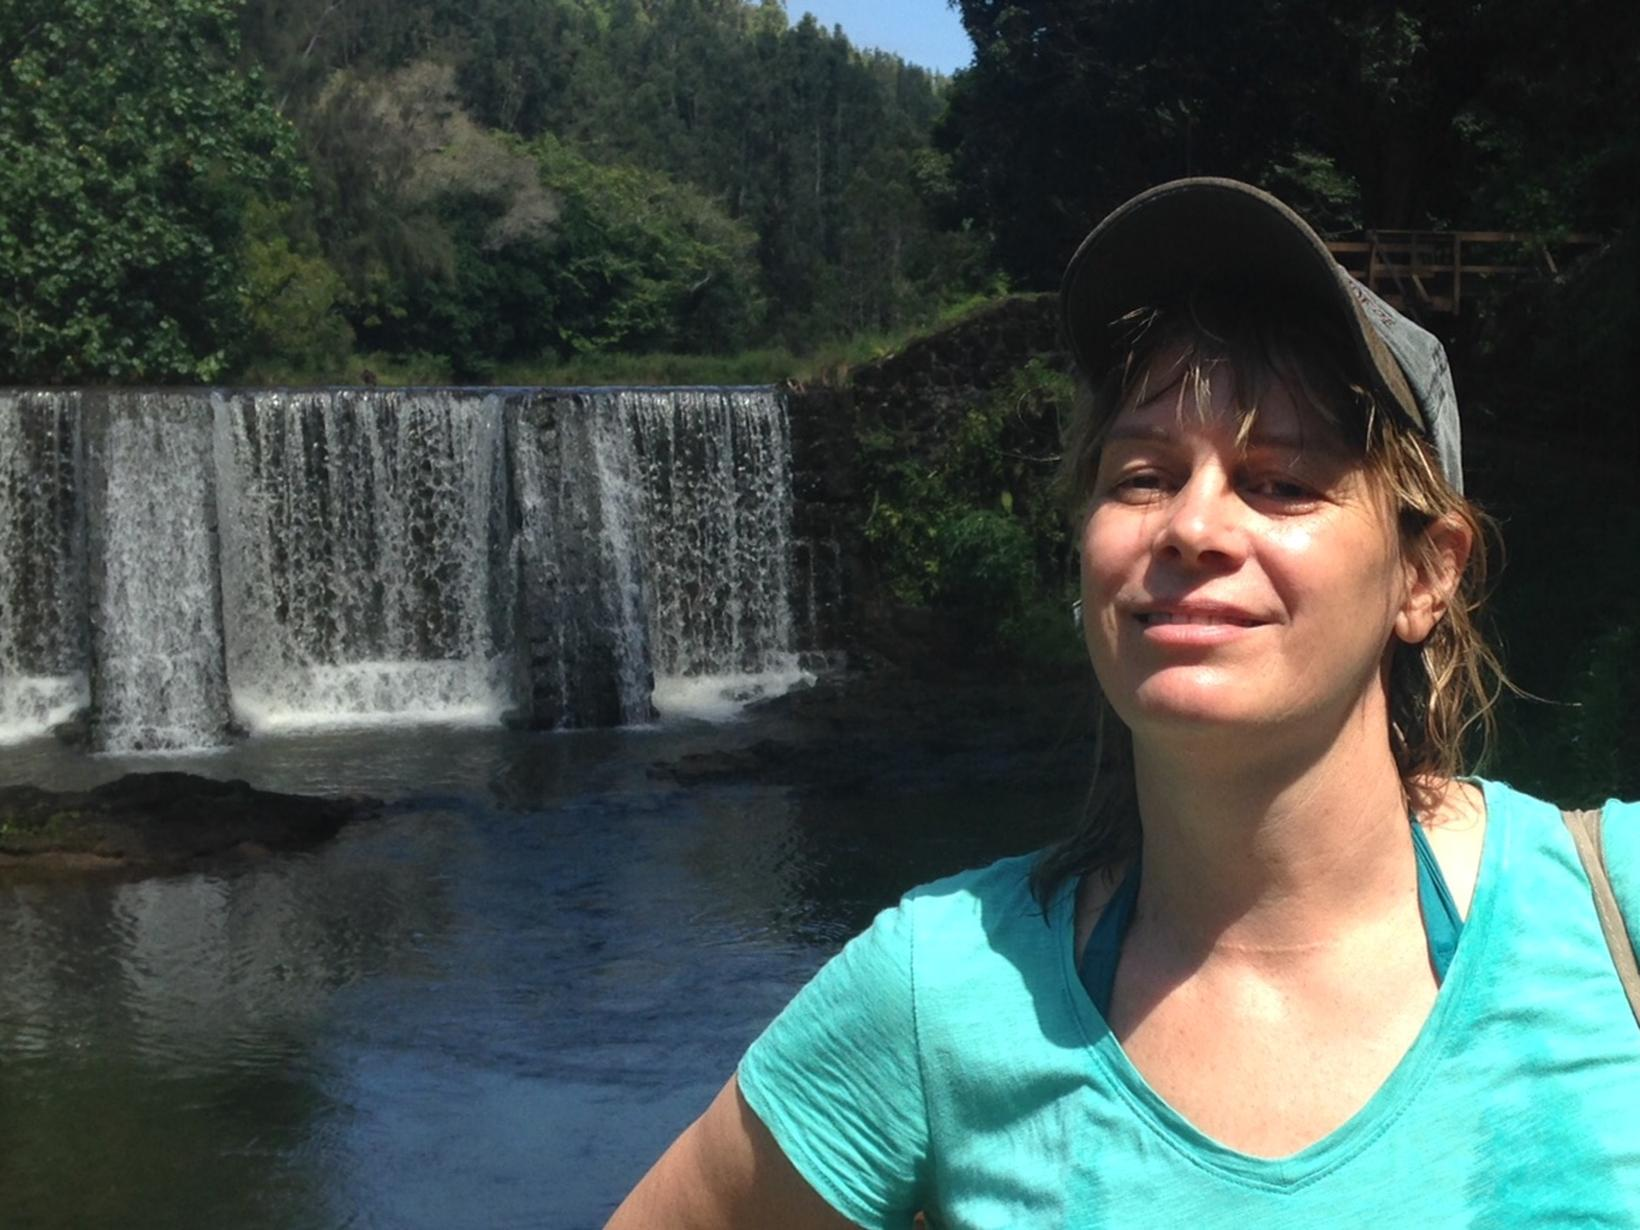 Simone from Vista, California, United States